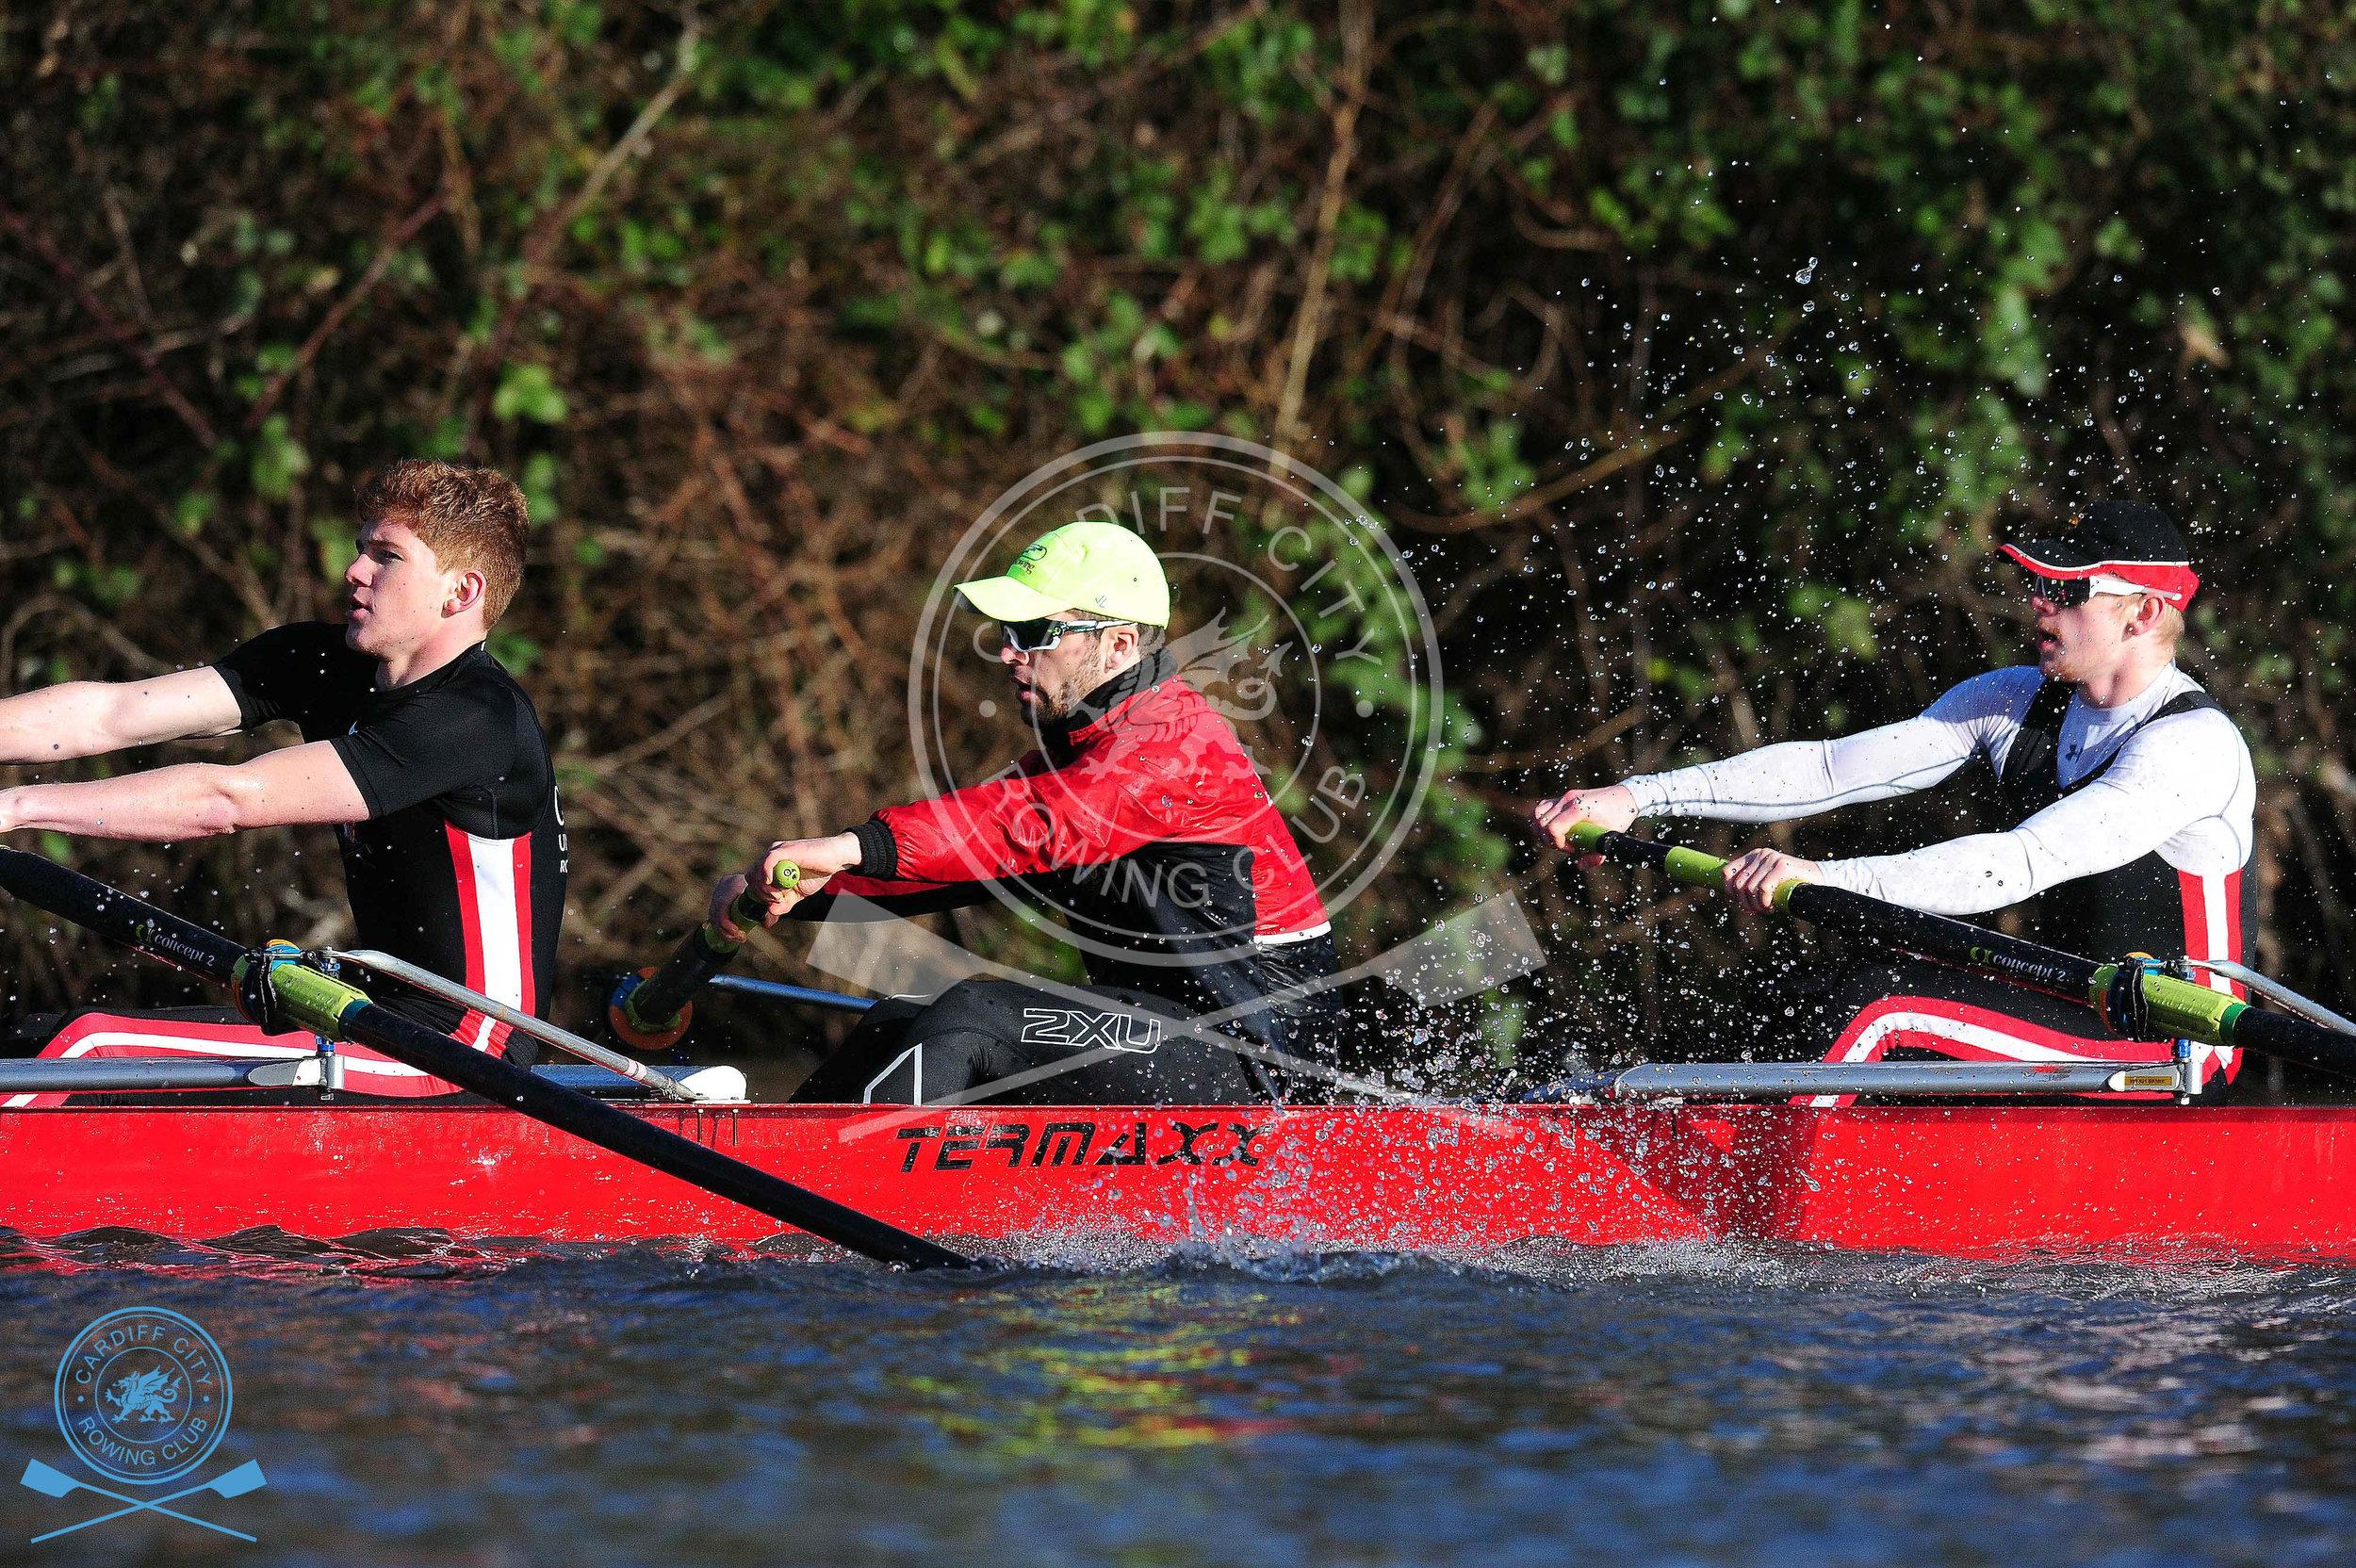 DW_280119_Cardiff_City_Rowing_226.jpg